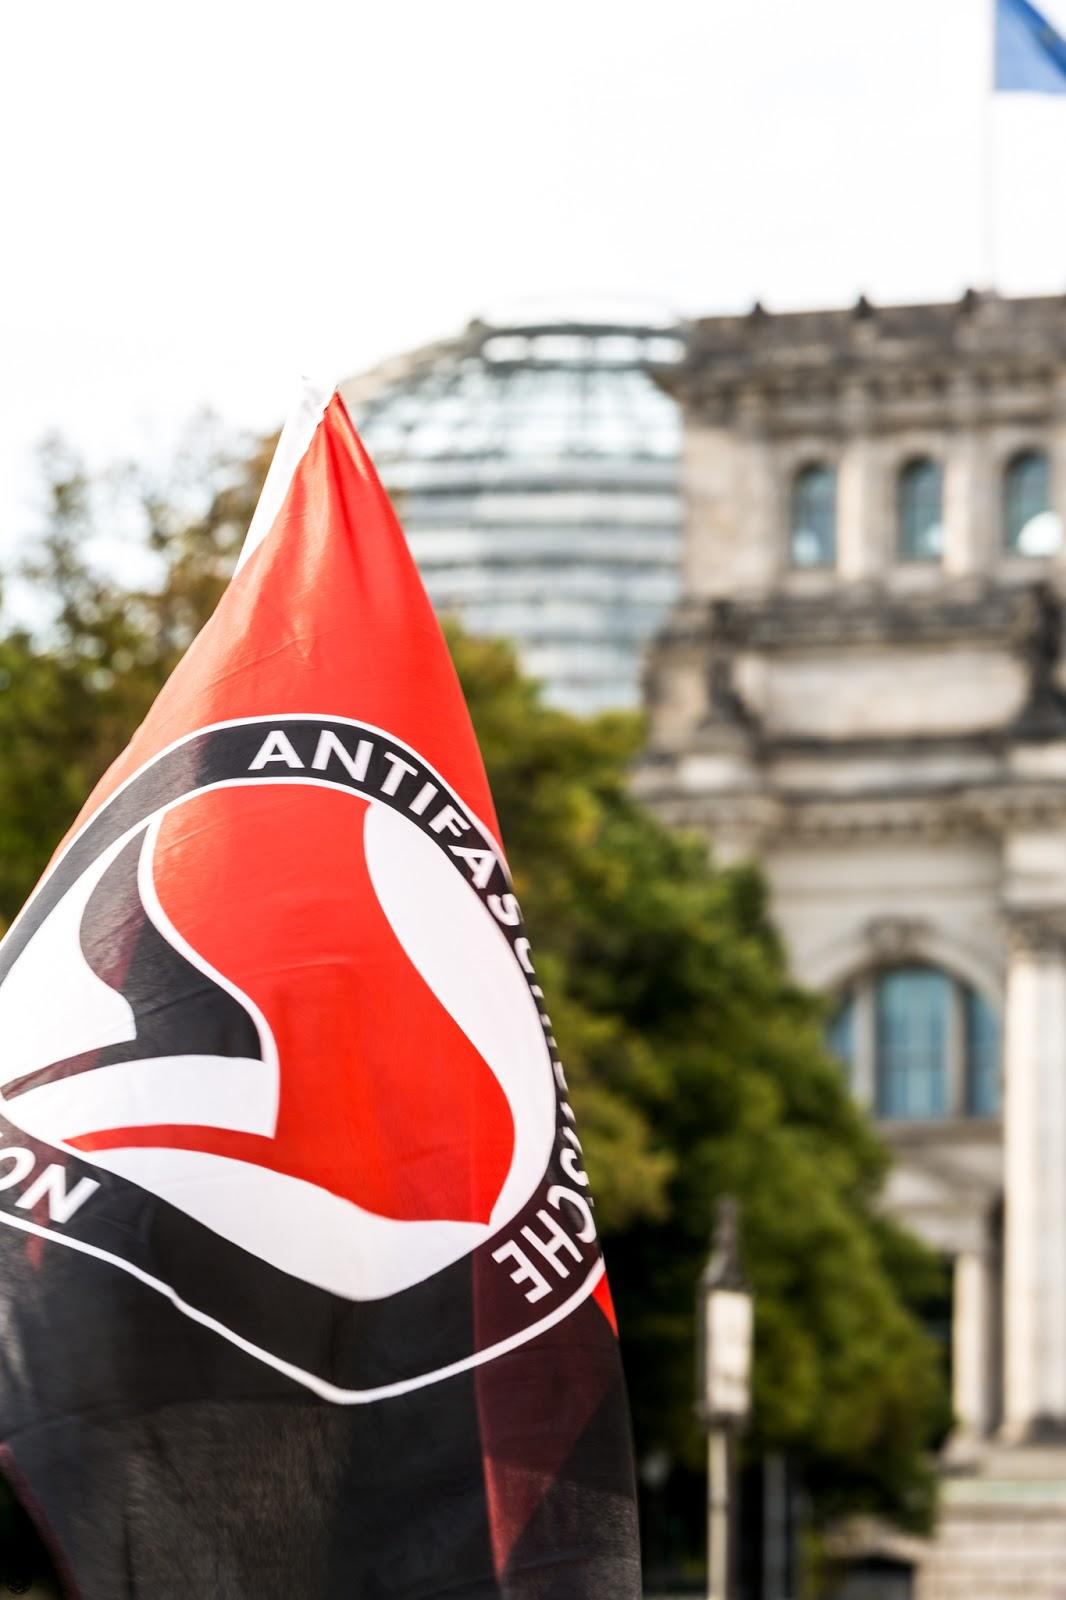 Emblema de Antifaschistische Aktion delante del Parlamento :: Canon EOS5D MkIII | ISO100 | Canon70-200 @144mm | f/6.3 | 1/60s